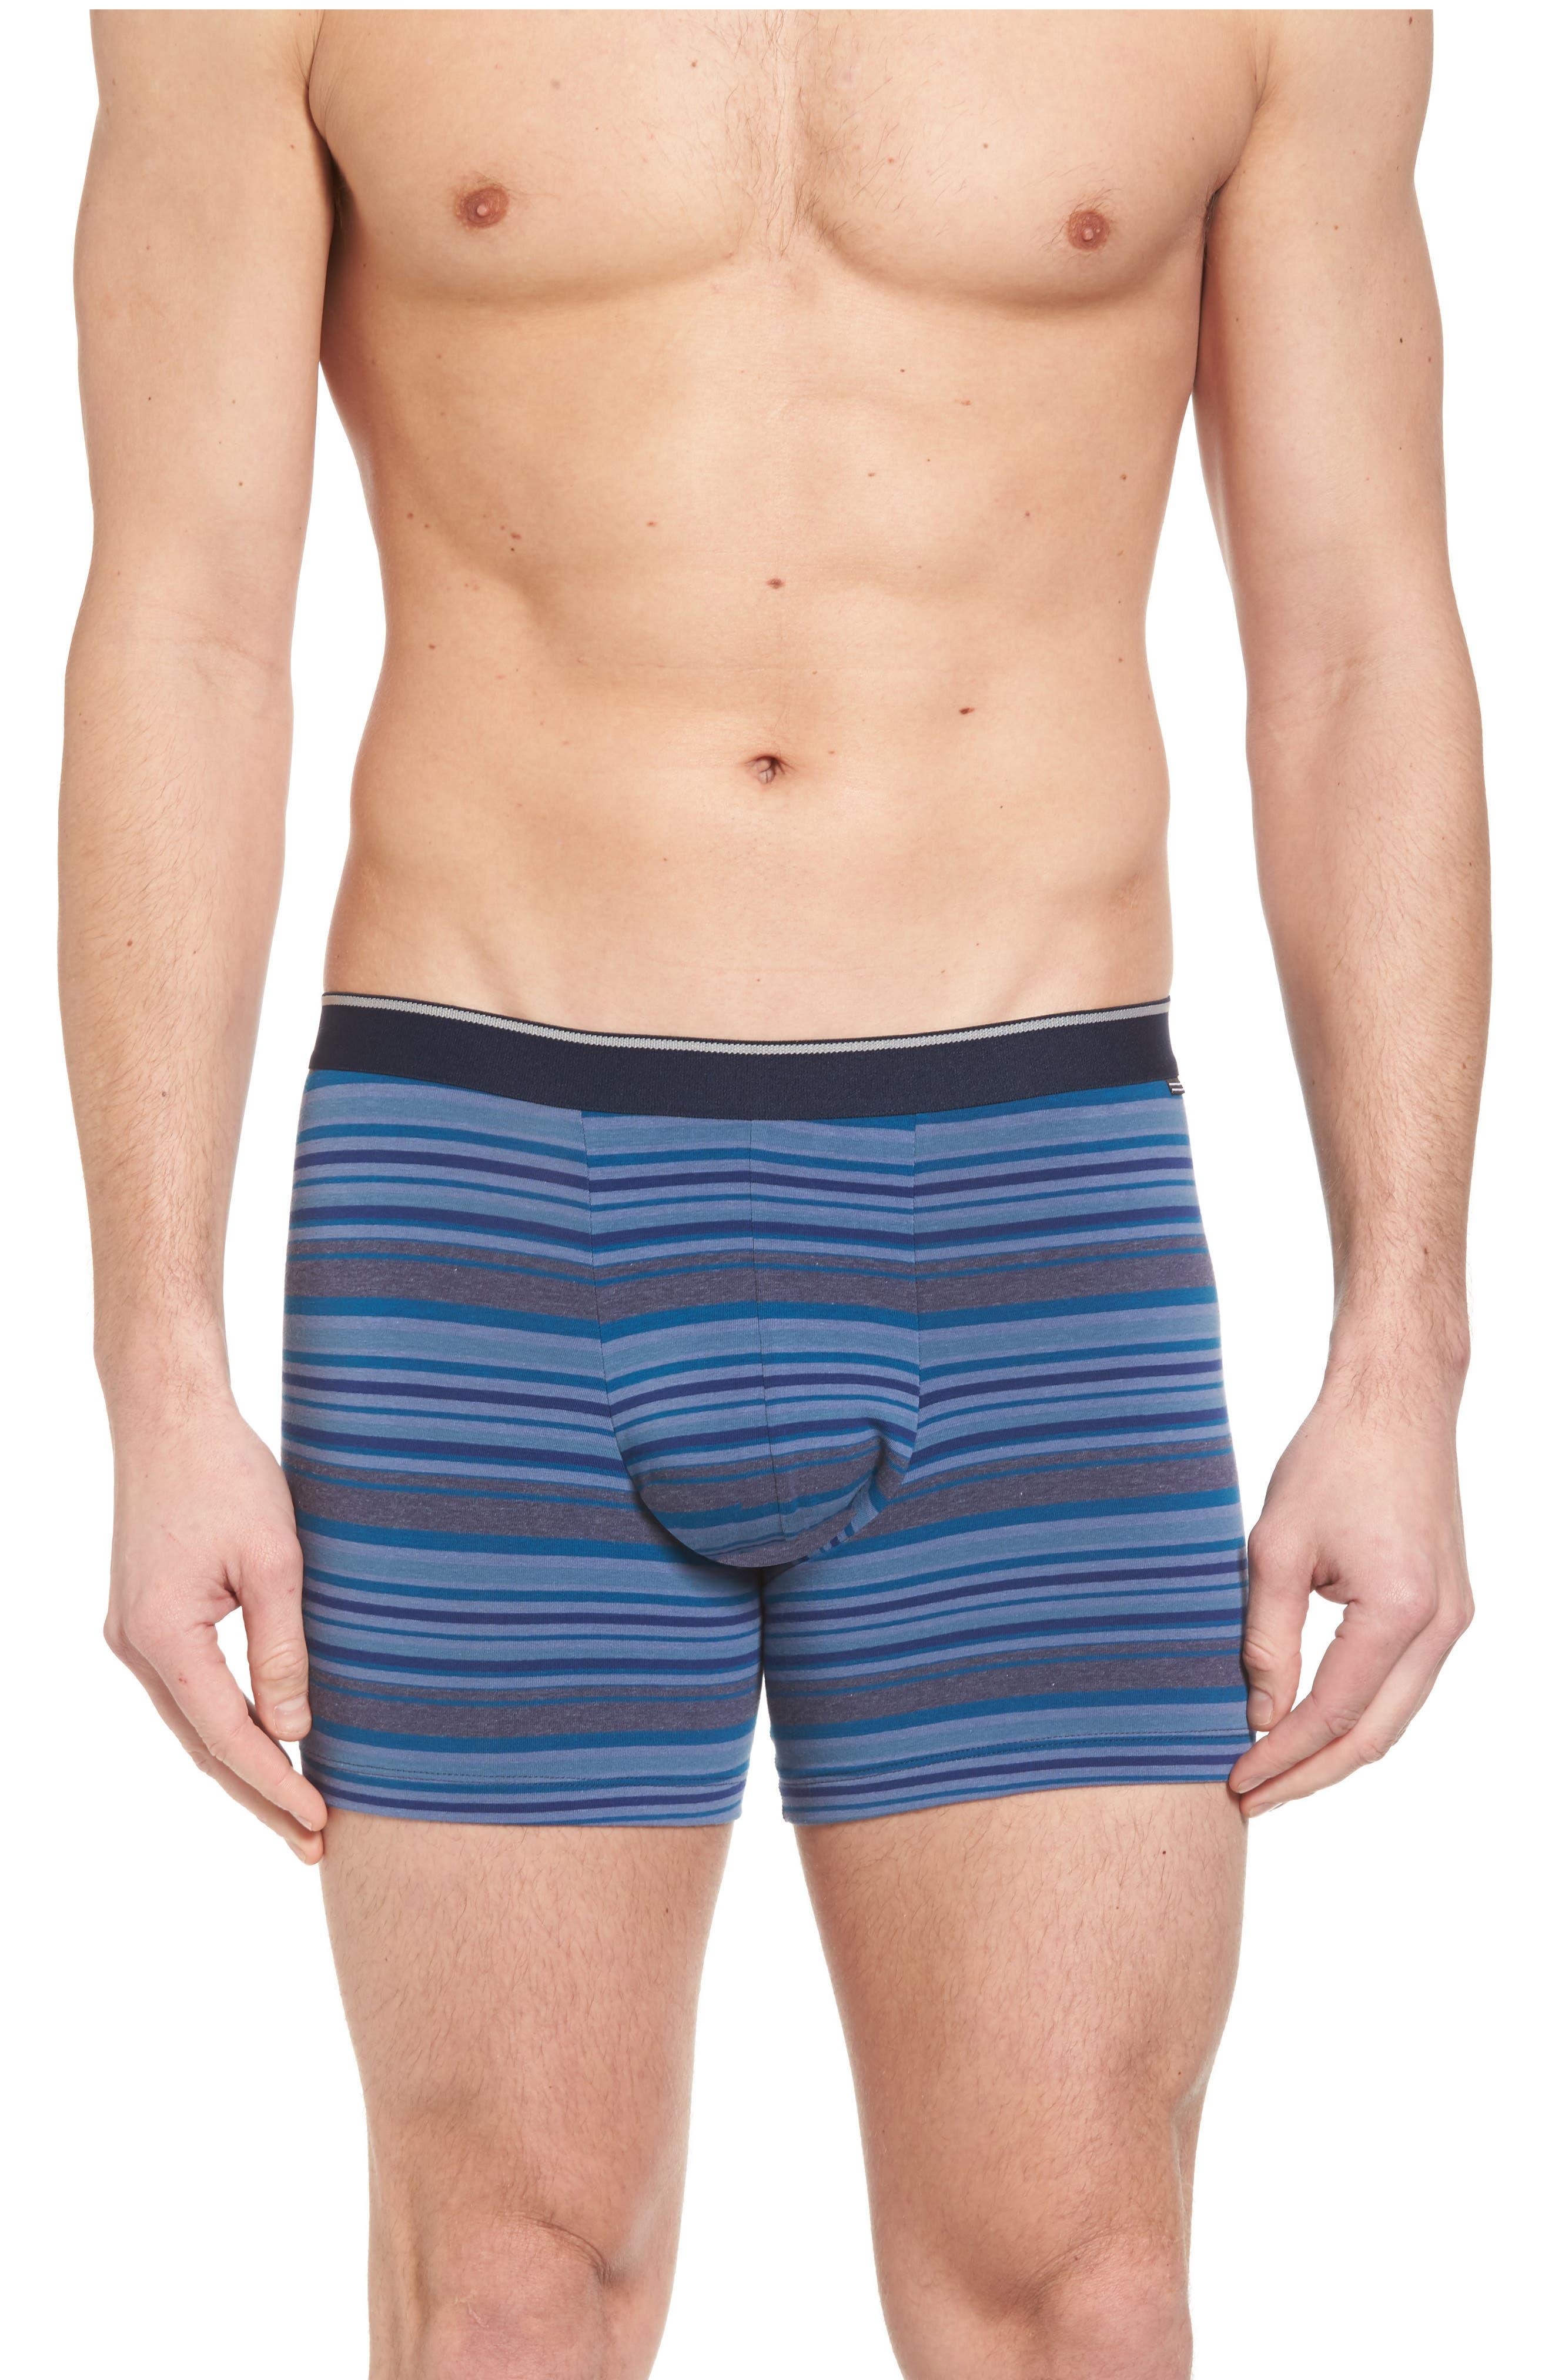 Pouch Briefs,                         Main,                         color, Blue Tonal Multi Stripe